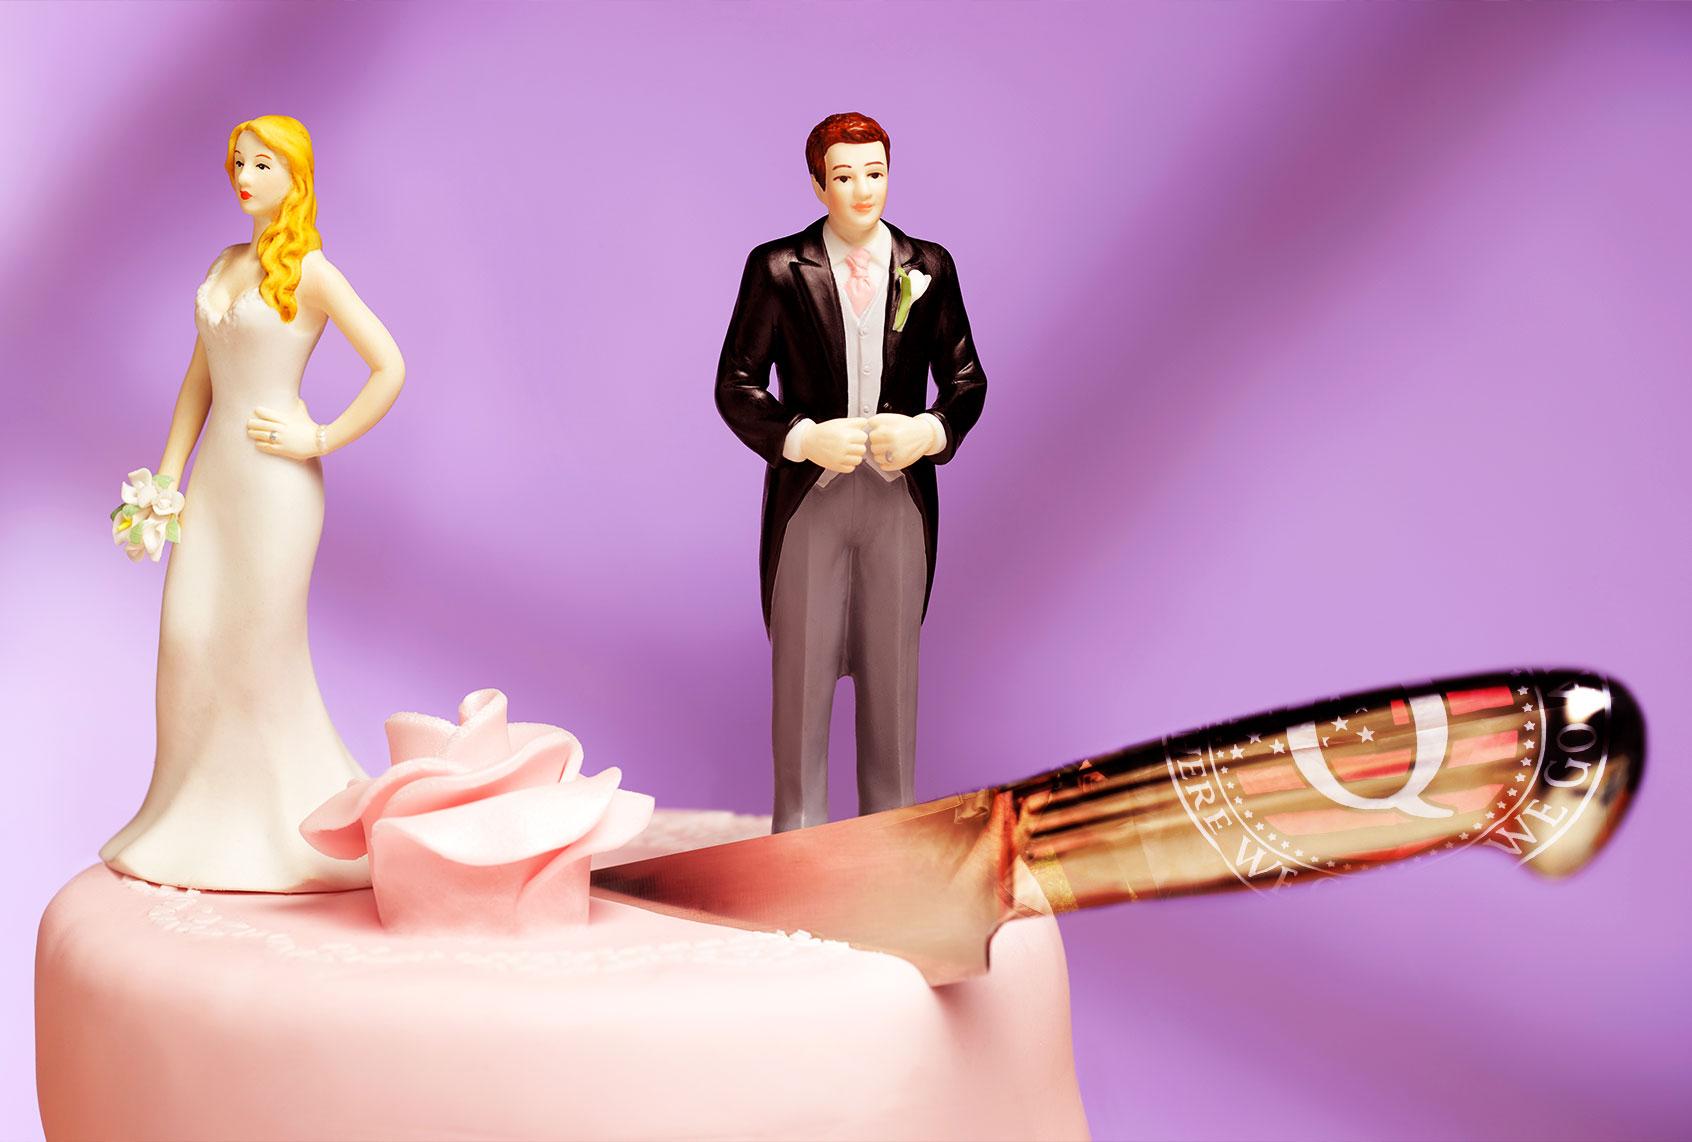 divorce-qanon-0224211.jpg